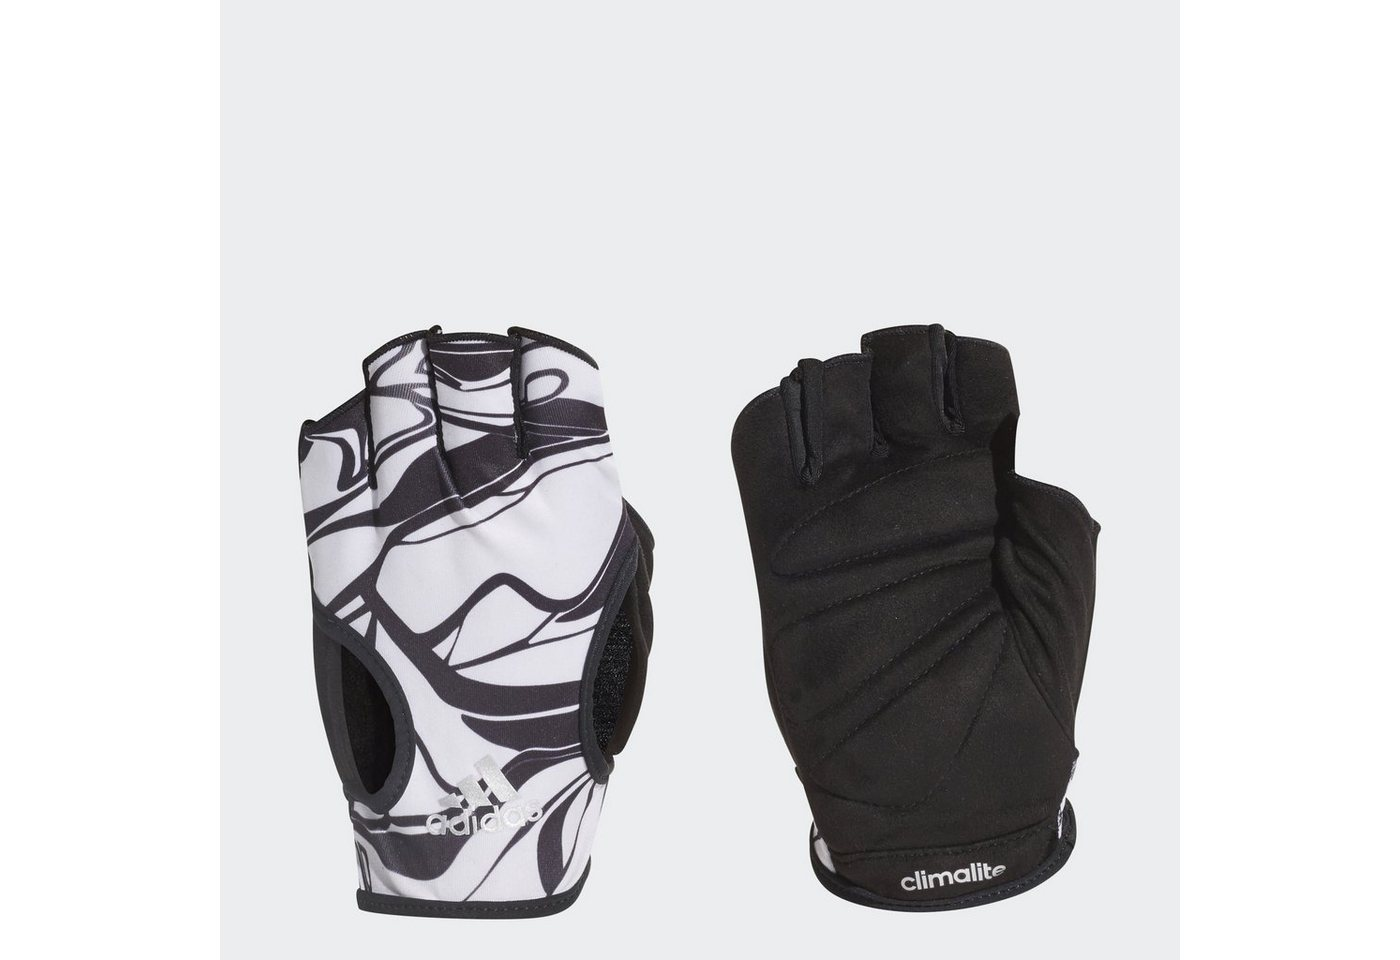 adidas Performance Trainingshandschuhe »Climalite Handschuhe« | Accessoires > Handschuhe > Sonstige Handschuhe | Weiß | Polyester - Elastan | adidas Performance